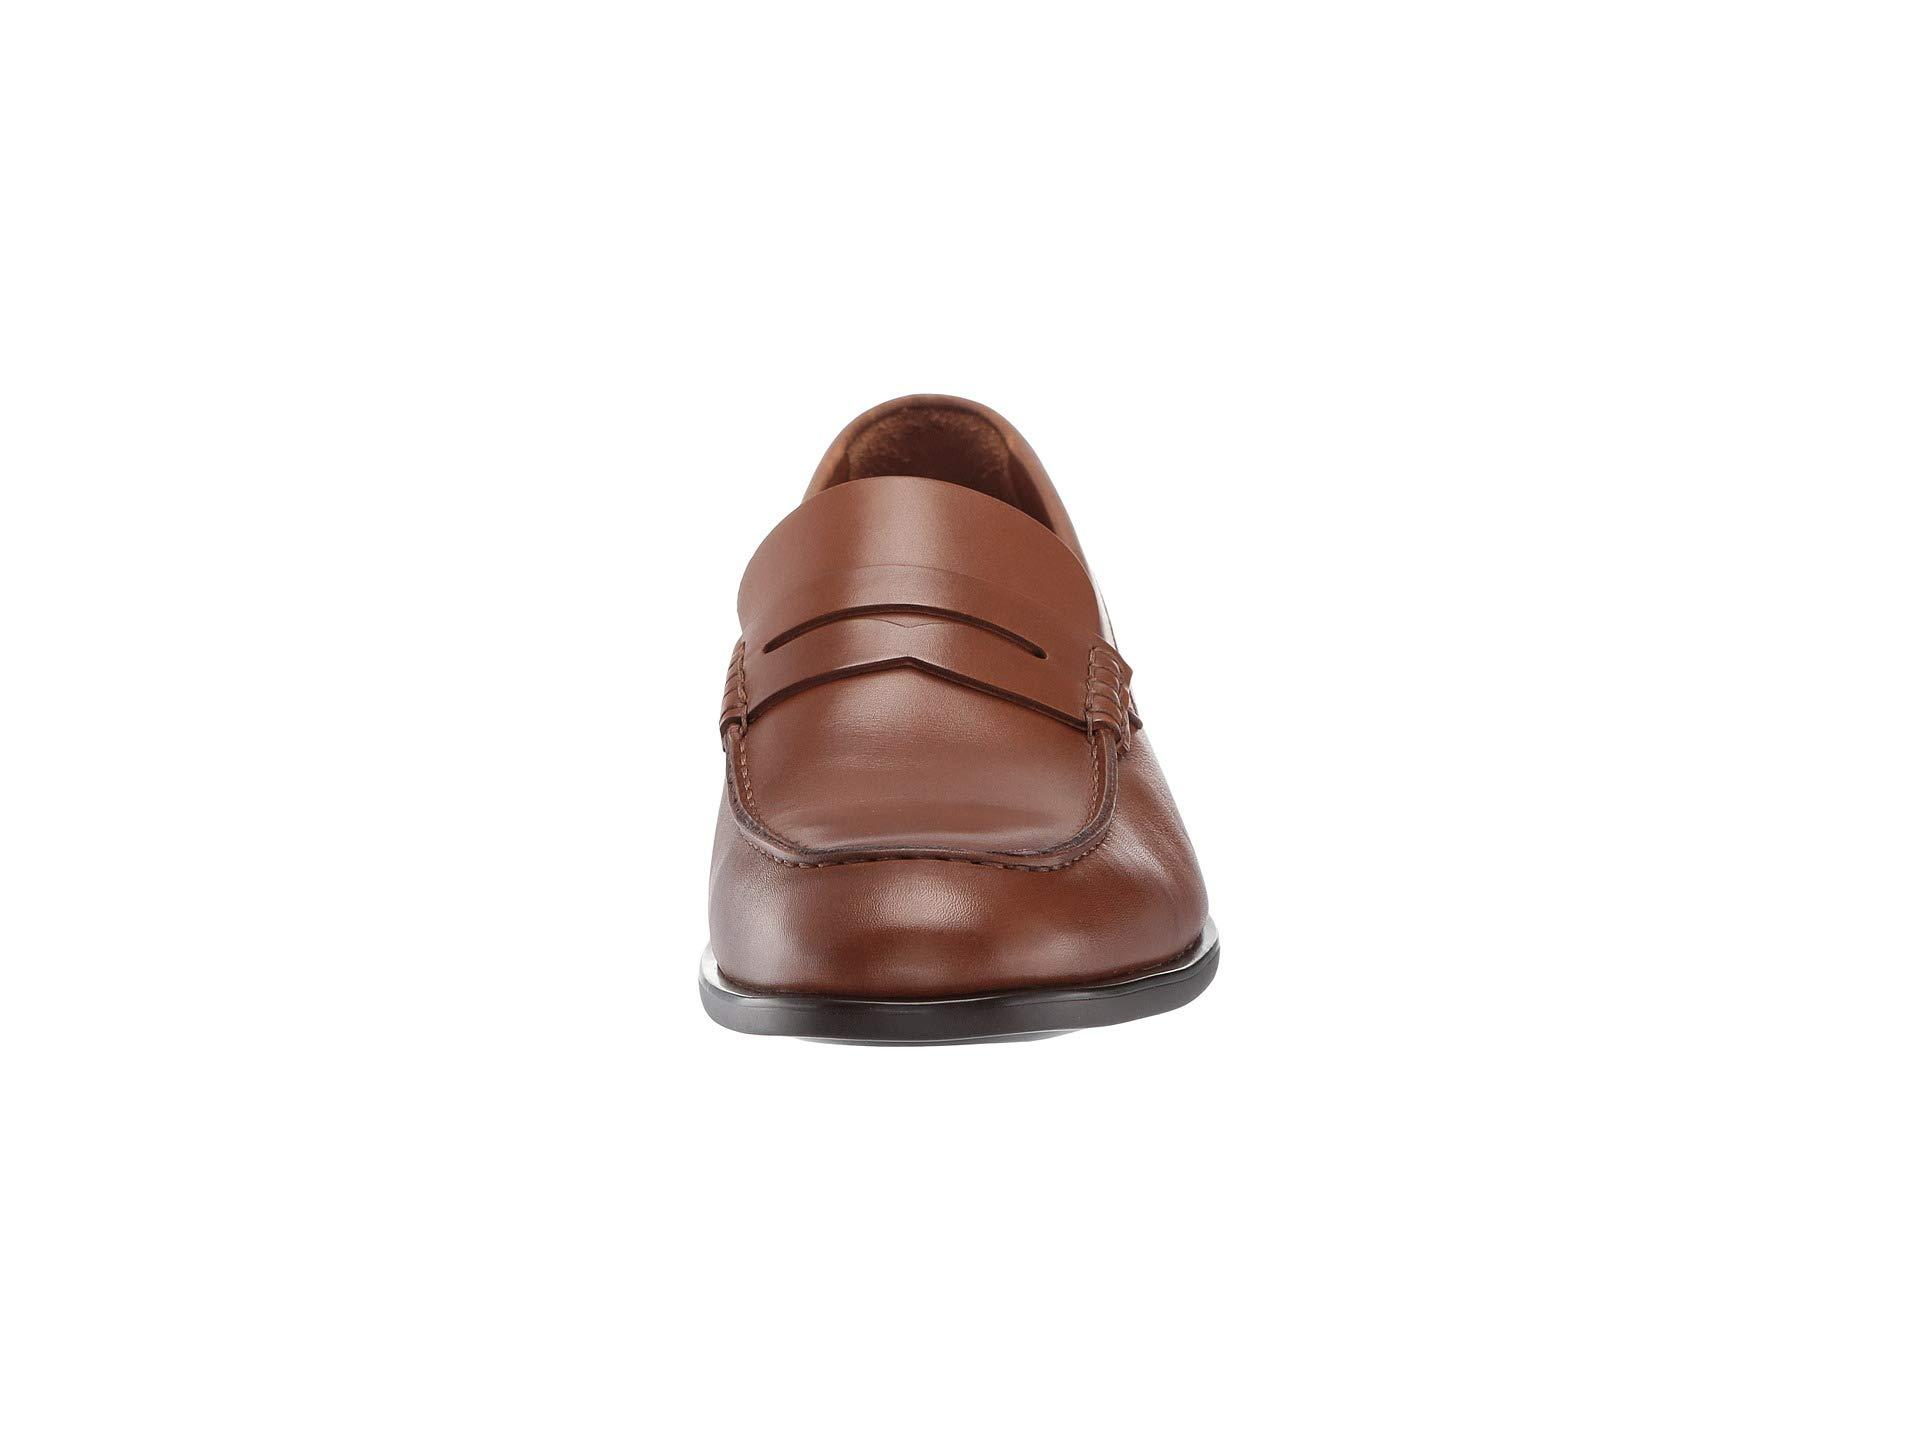 f4370ac6fa9 Lyst - Aquatalia Adamo (black Dress Calf) Men s Slip On Shoes in ...